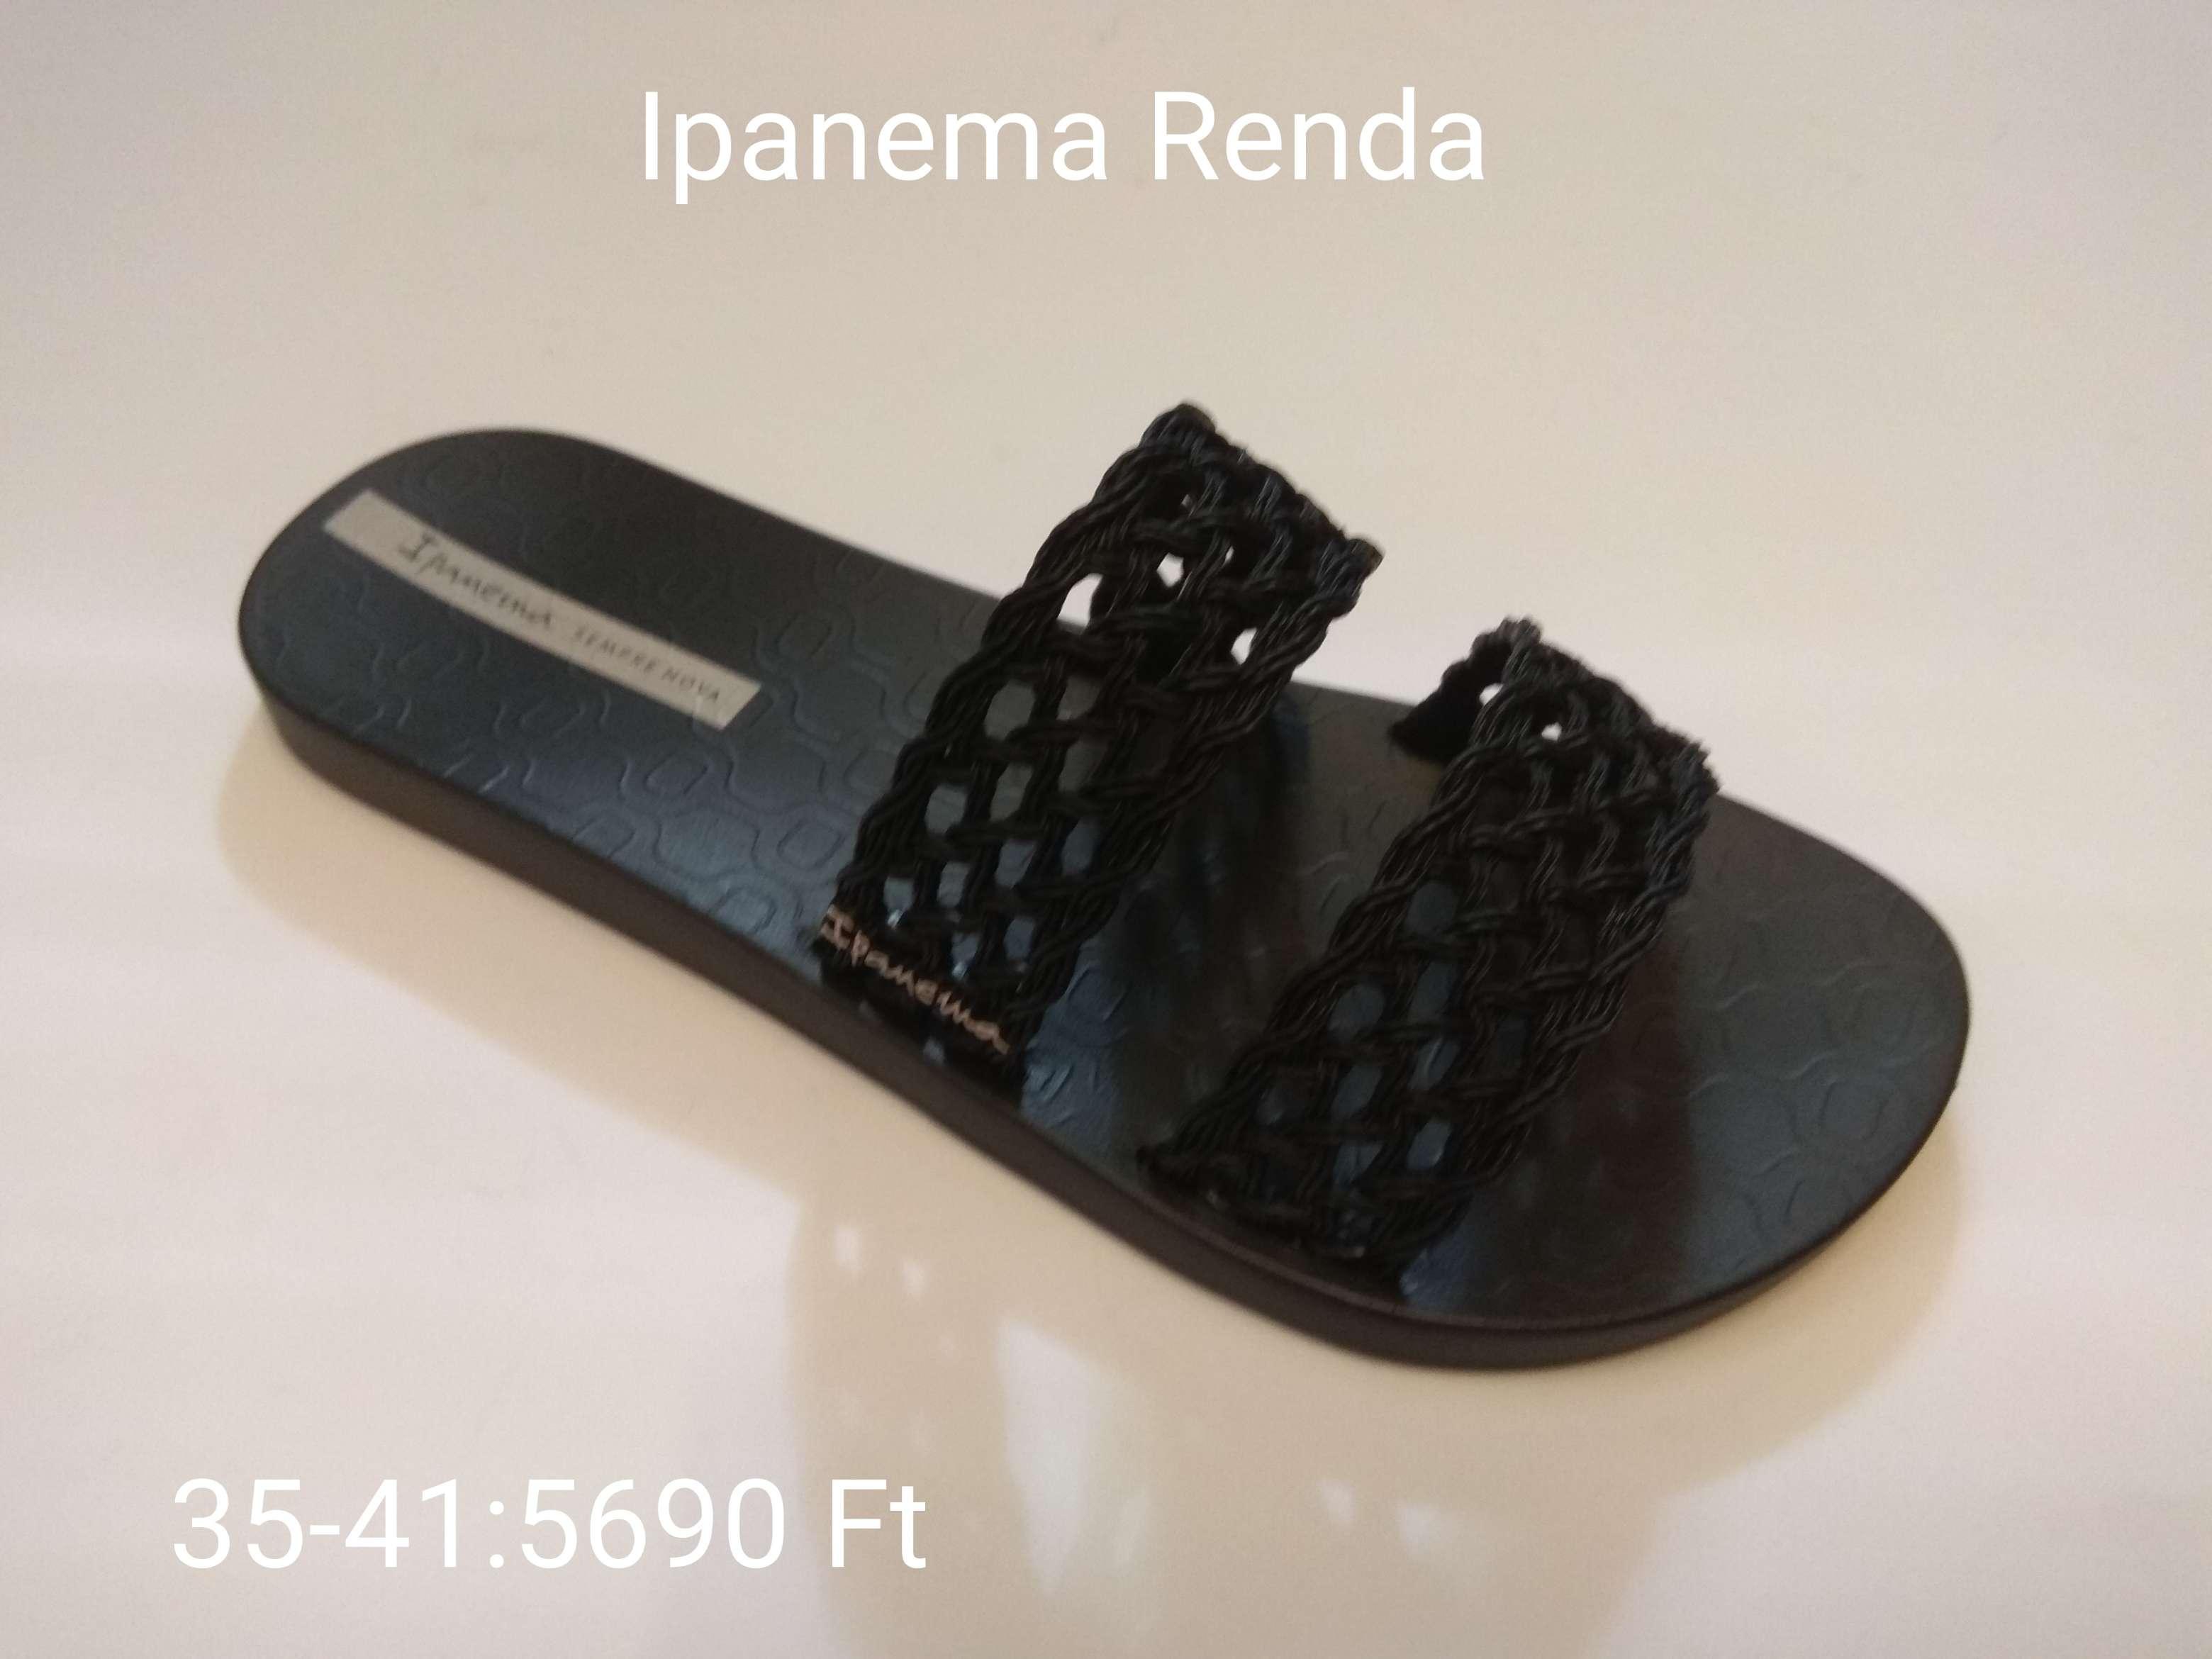 Ipanema Renda